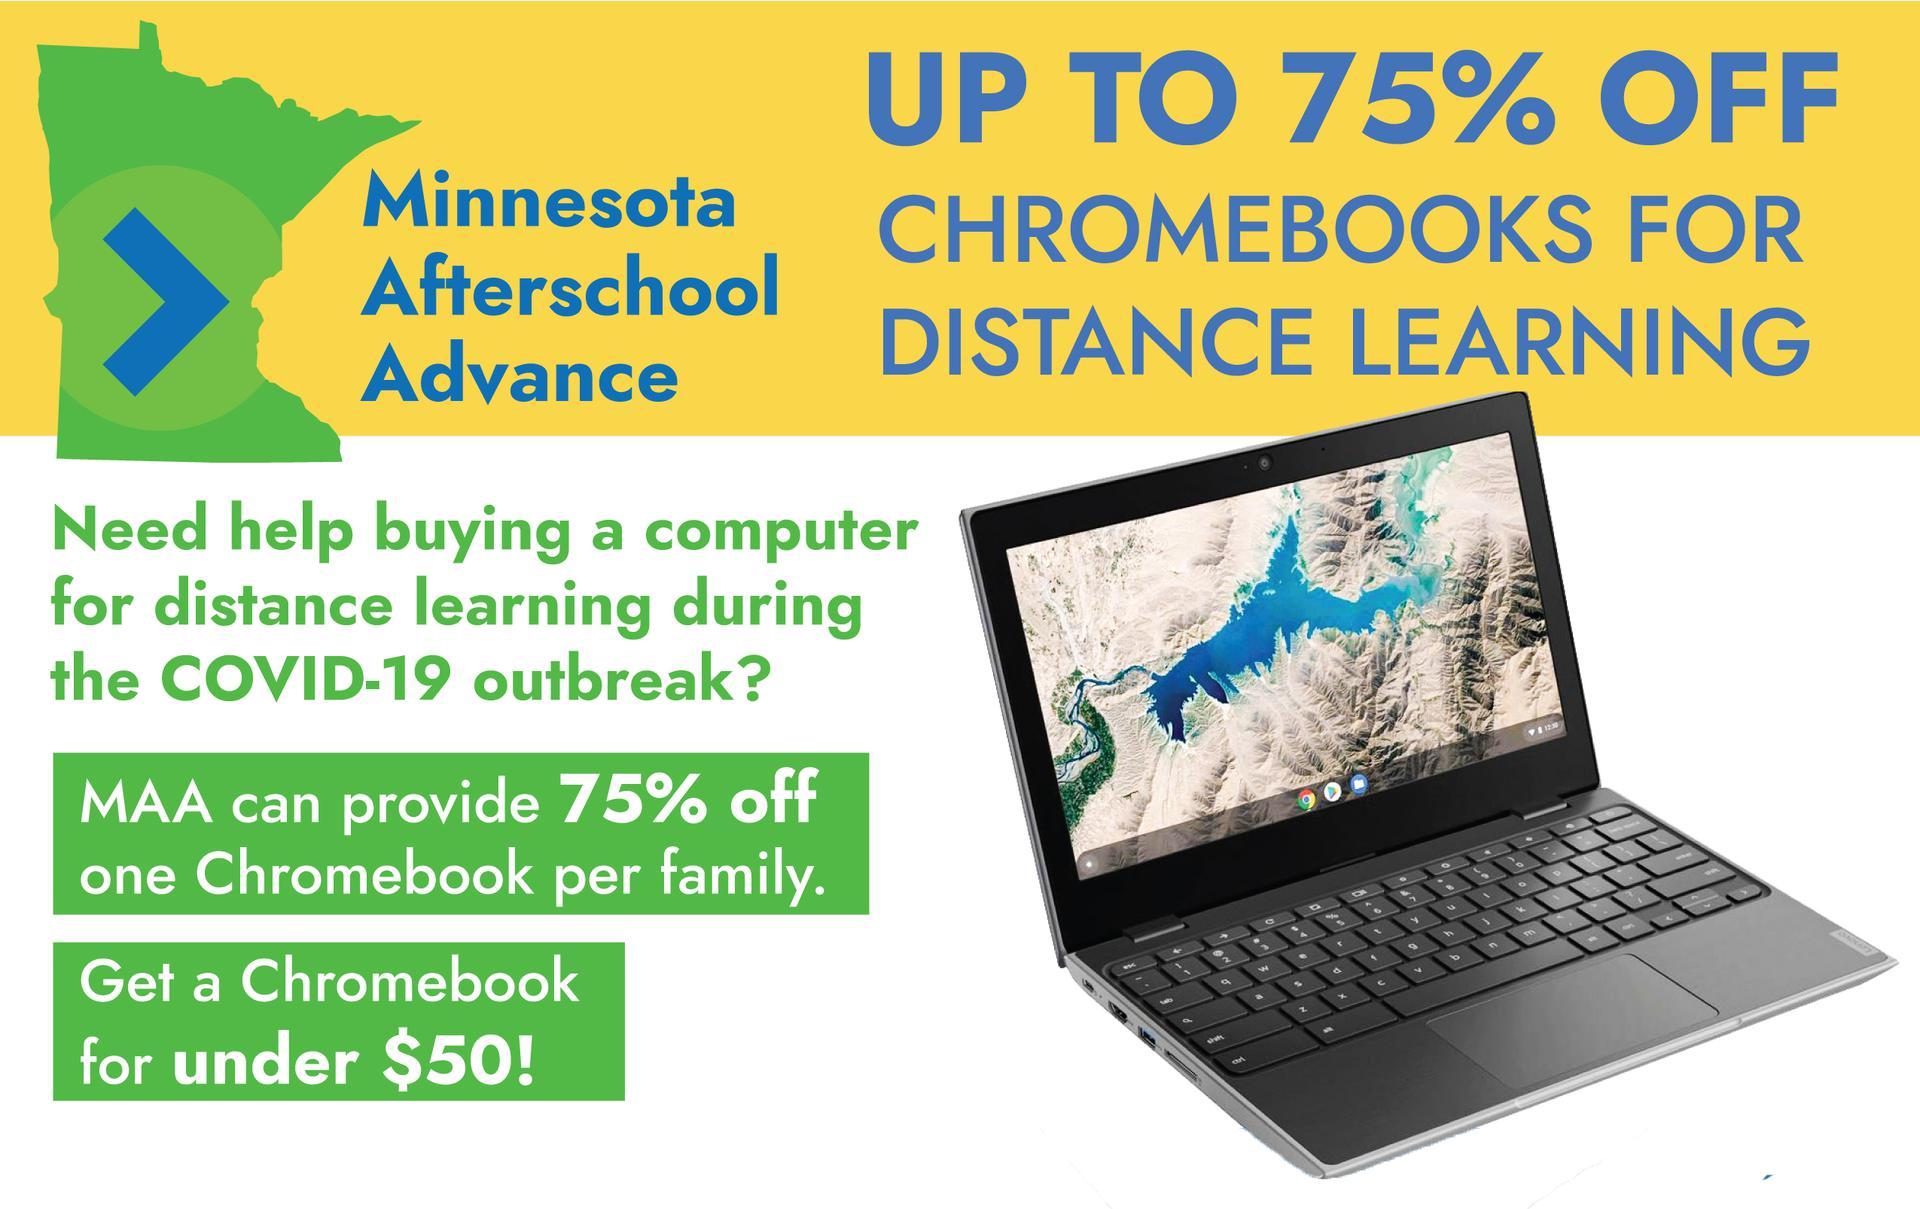 Minnesota Afterschool Advance - chromebooks